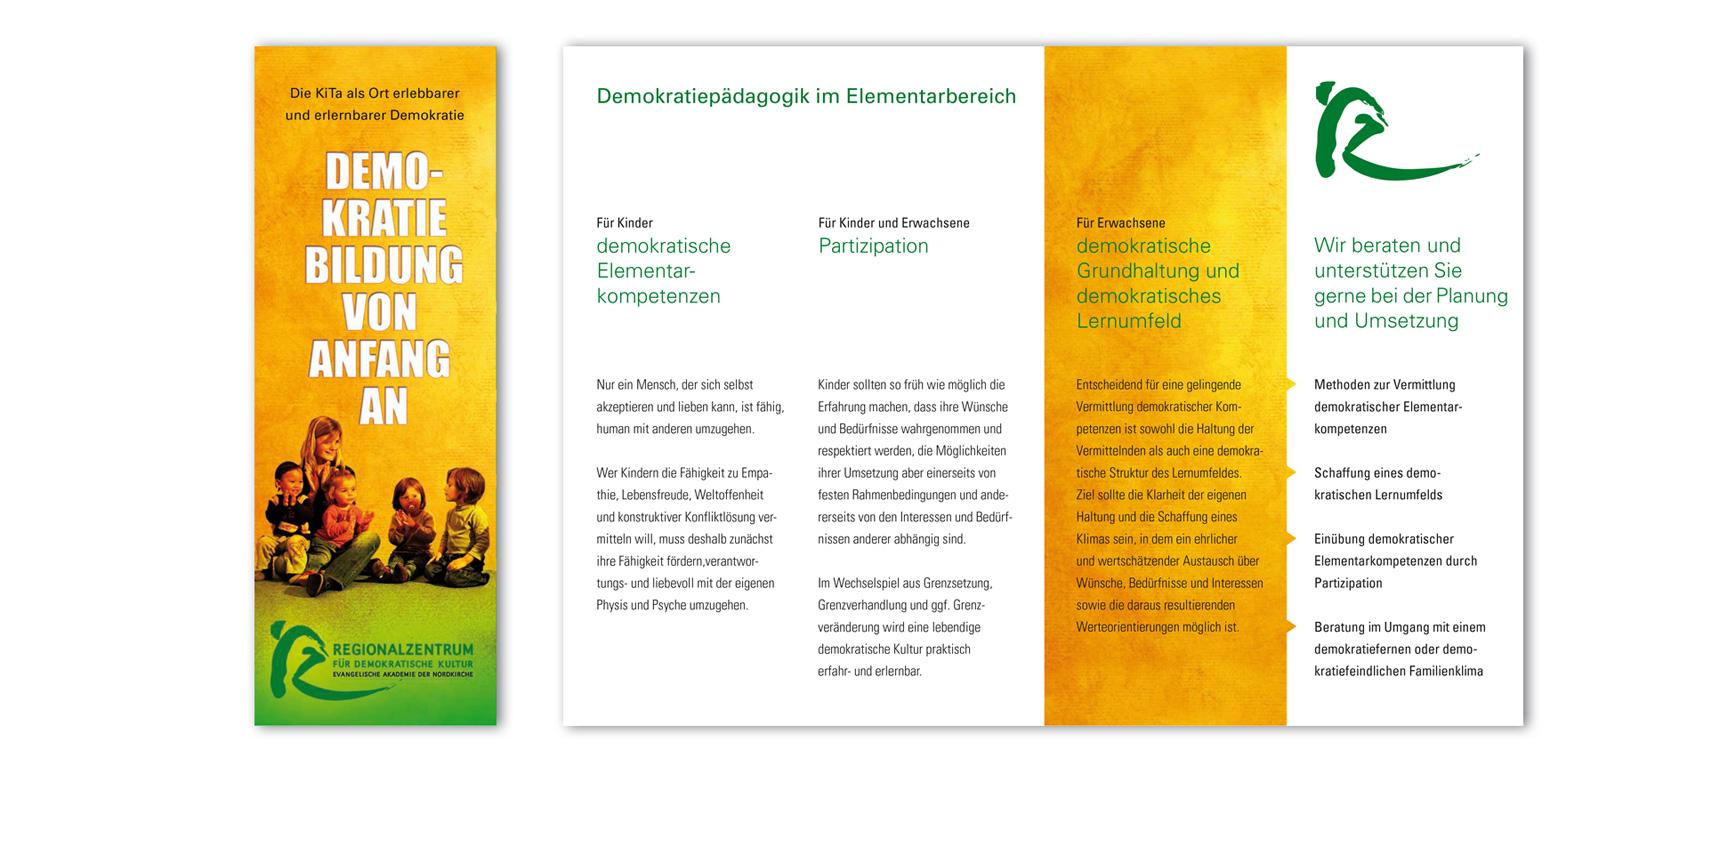 Demokratiepädagogik im Elementarbereich | Faltblatt